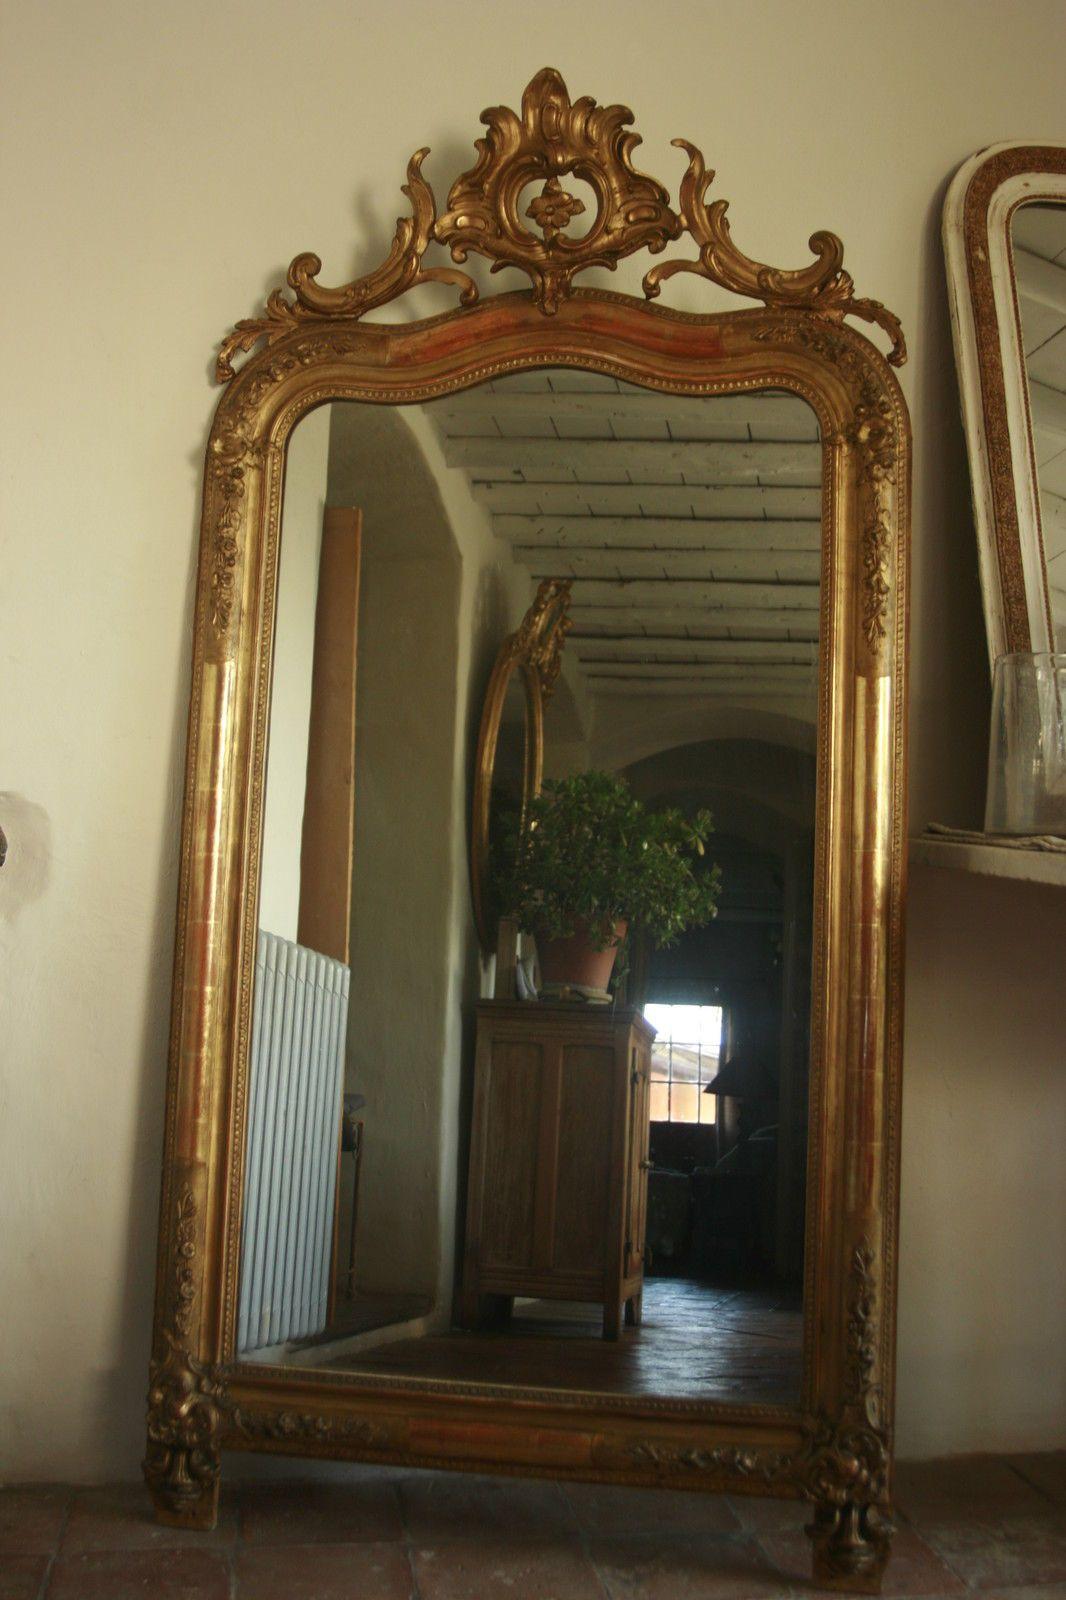 174x86 grand miroir ancien louis philippe dore a la feuille ebay miroirs lustre brocante. Black Bedroom Furniture Sets. Home Design Ideas